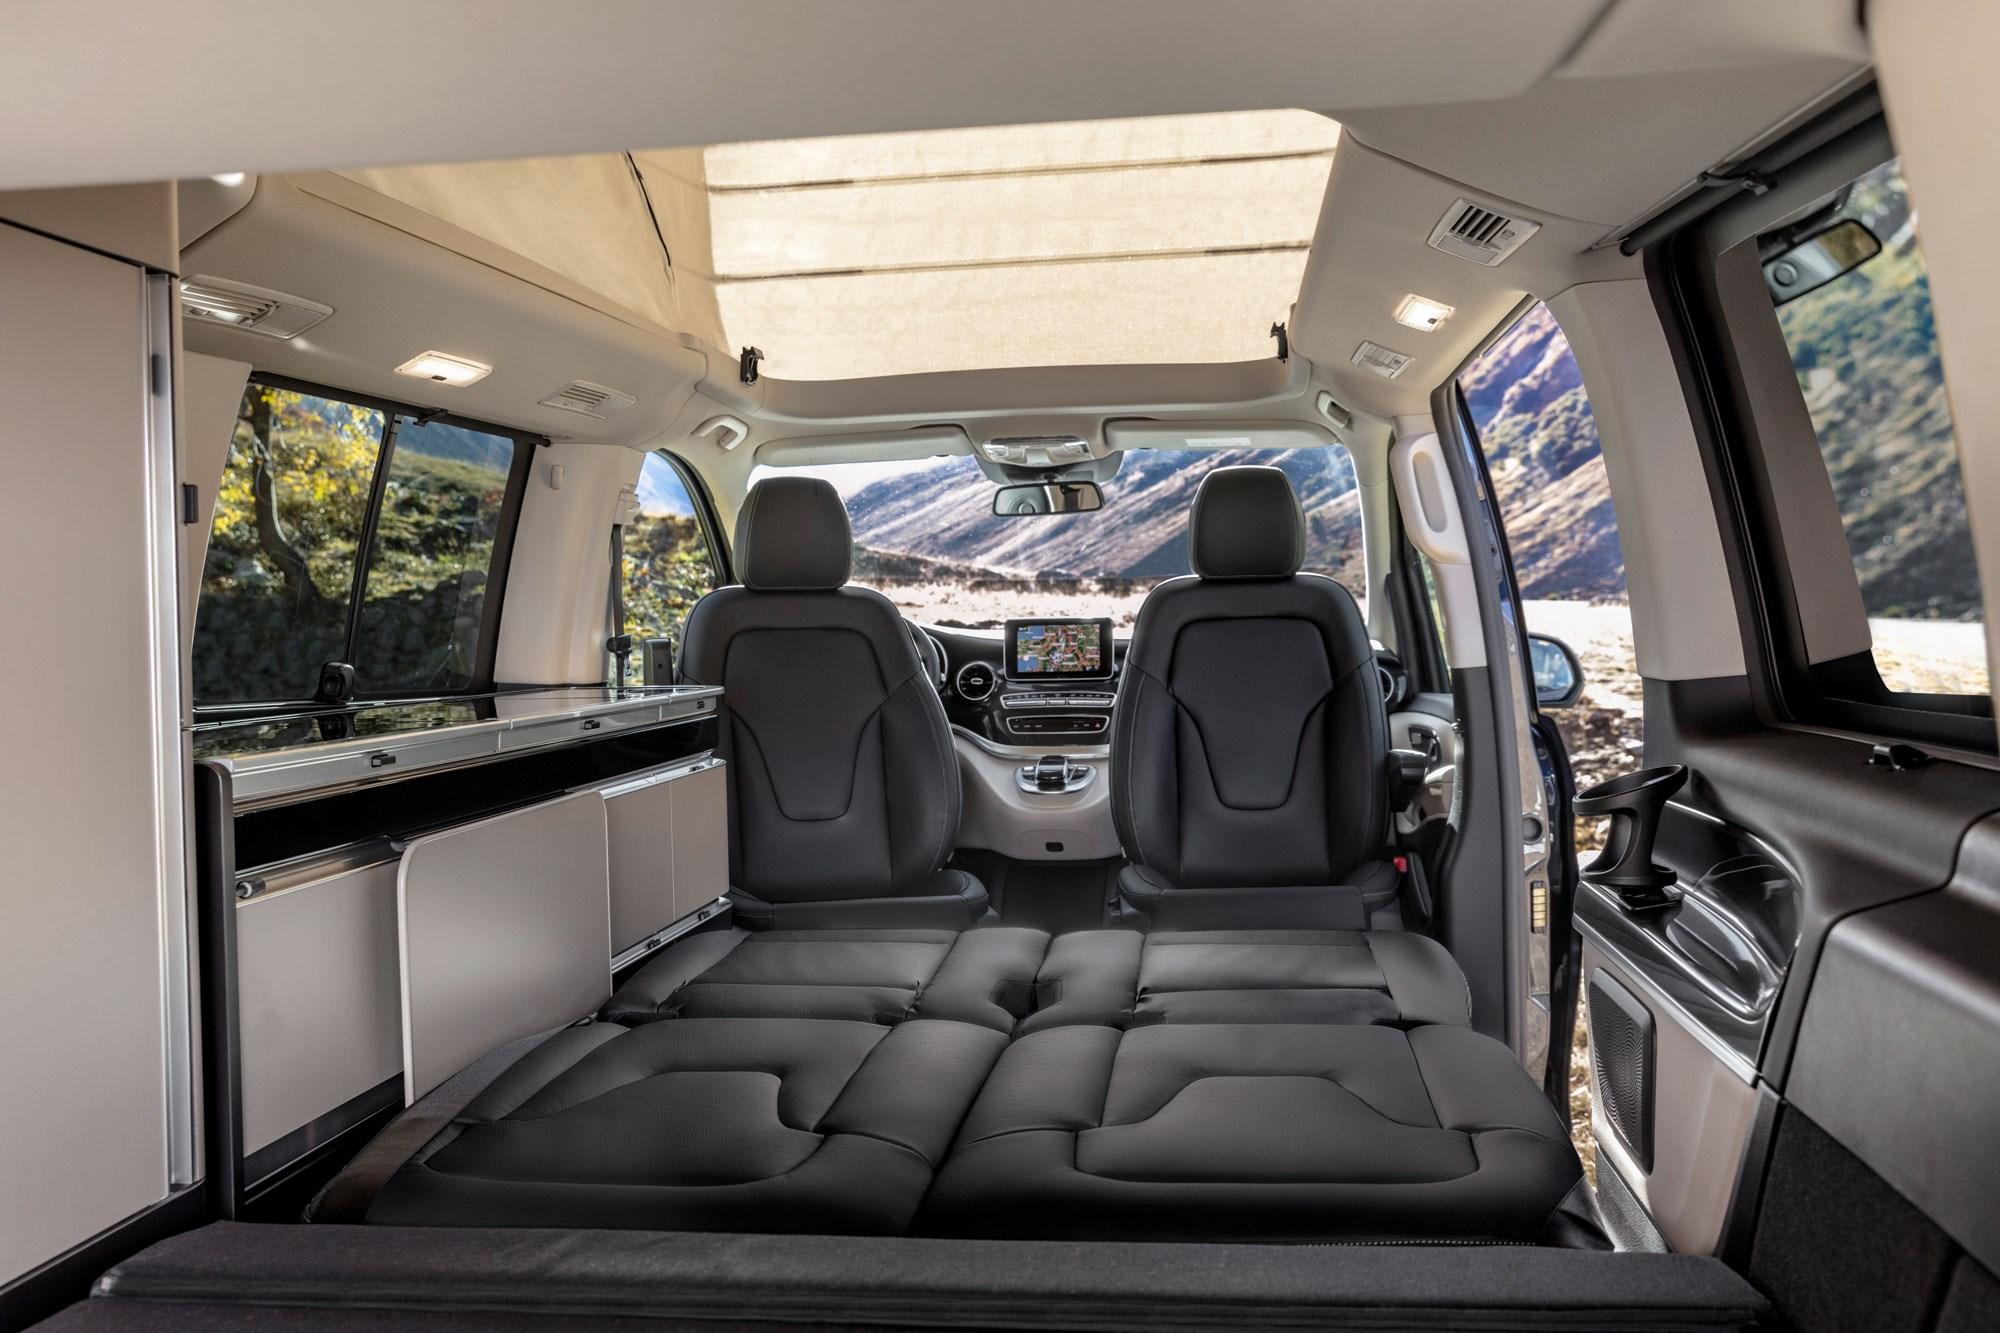 Mercedes V-Class - fashionable interior - GoodAutoDeals